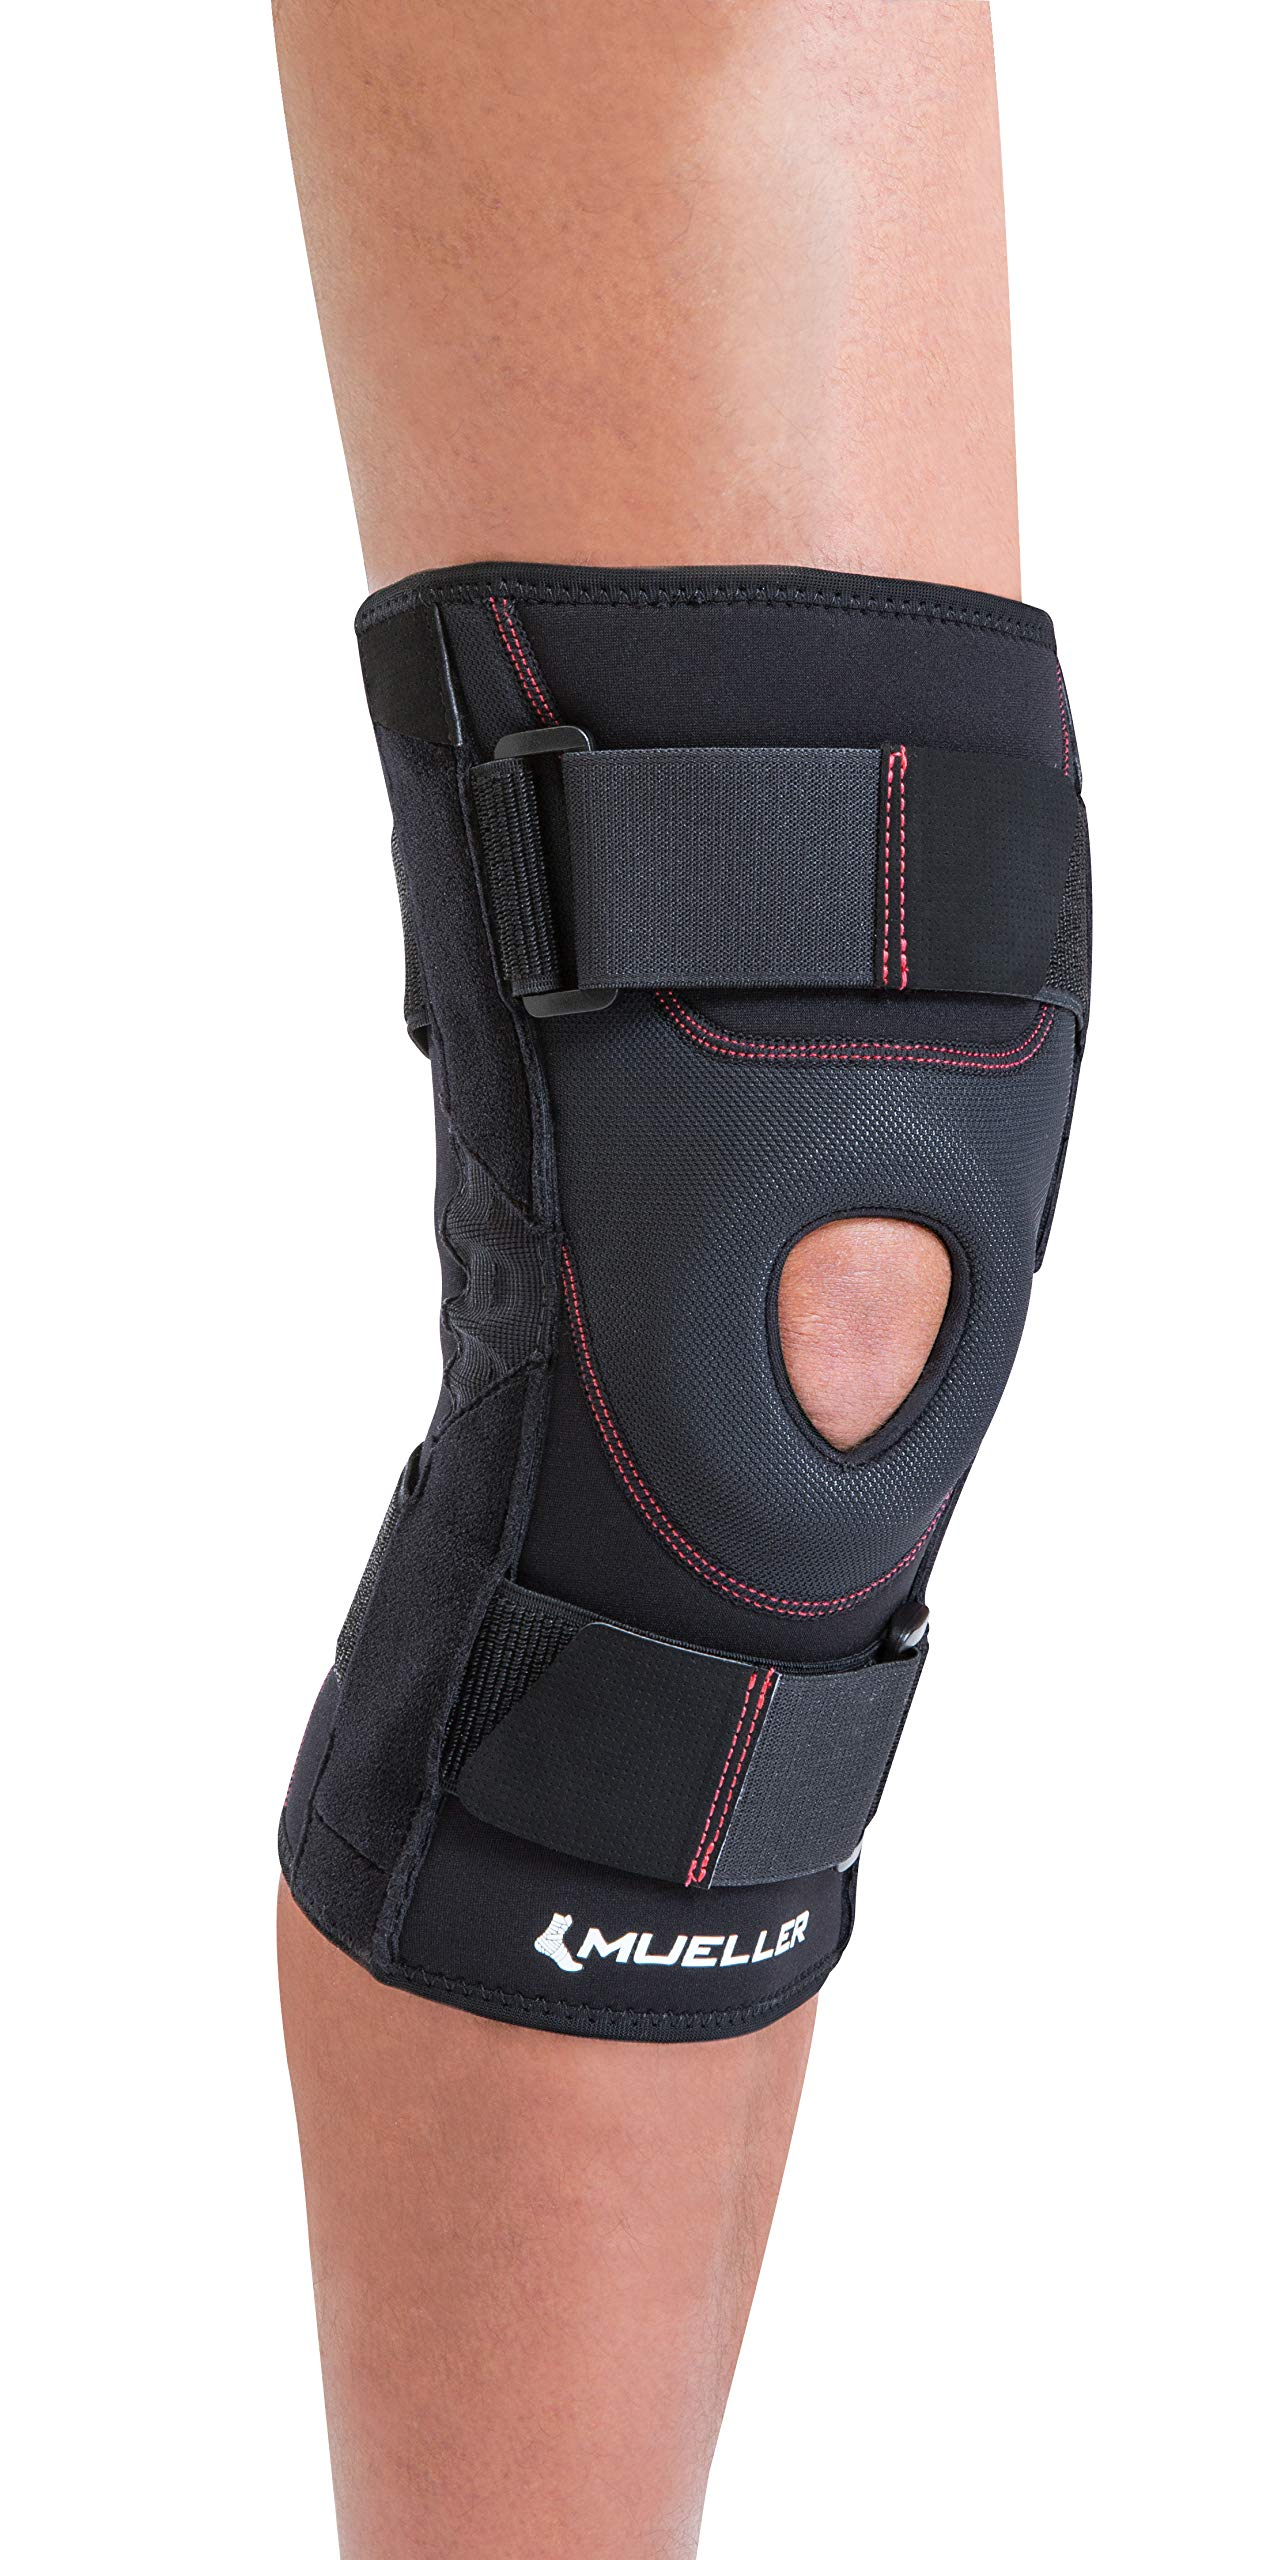 Mueller Patella Knee Stabilizer Brace, Black, X-Large